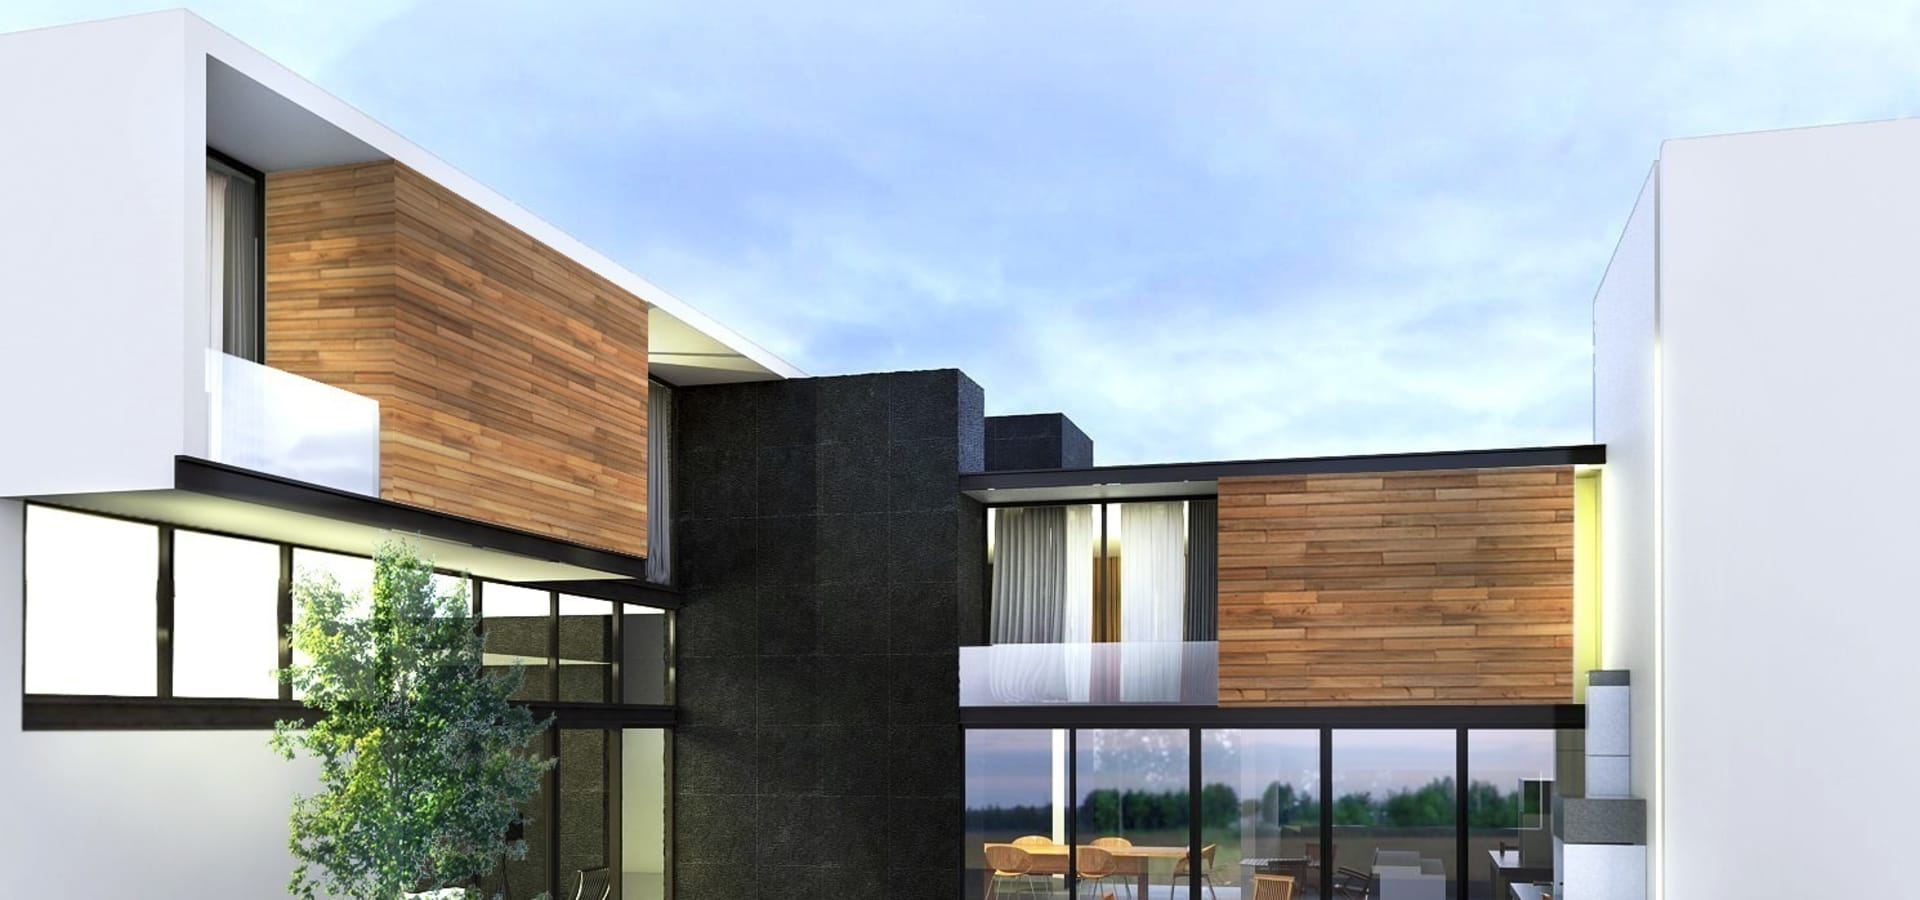 fosters bar steakhouse von taller habitat arquitectos homify. Black Bedroom Furniture Sets. Home Design Ideas